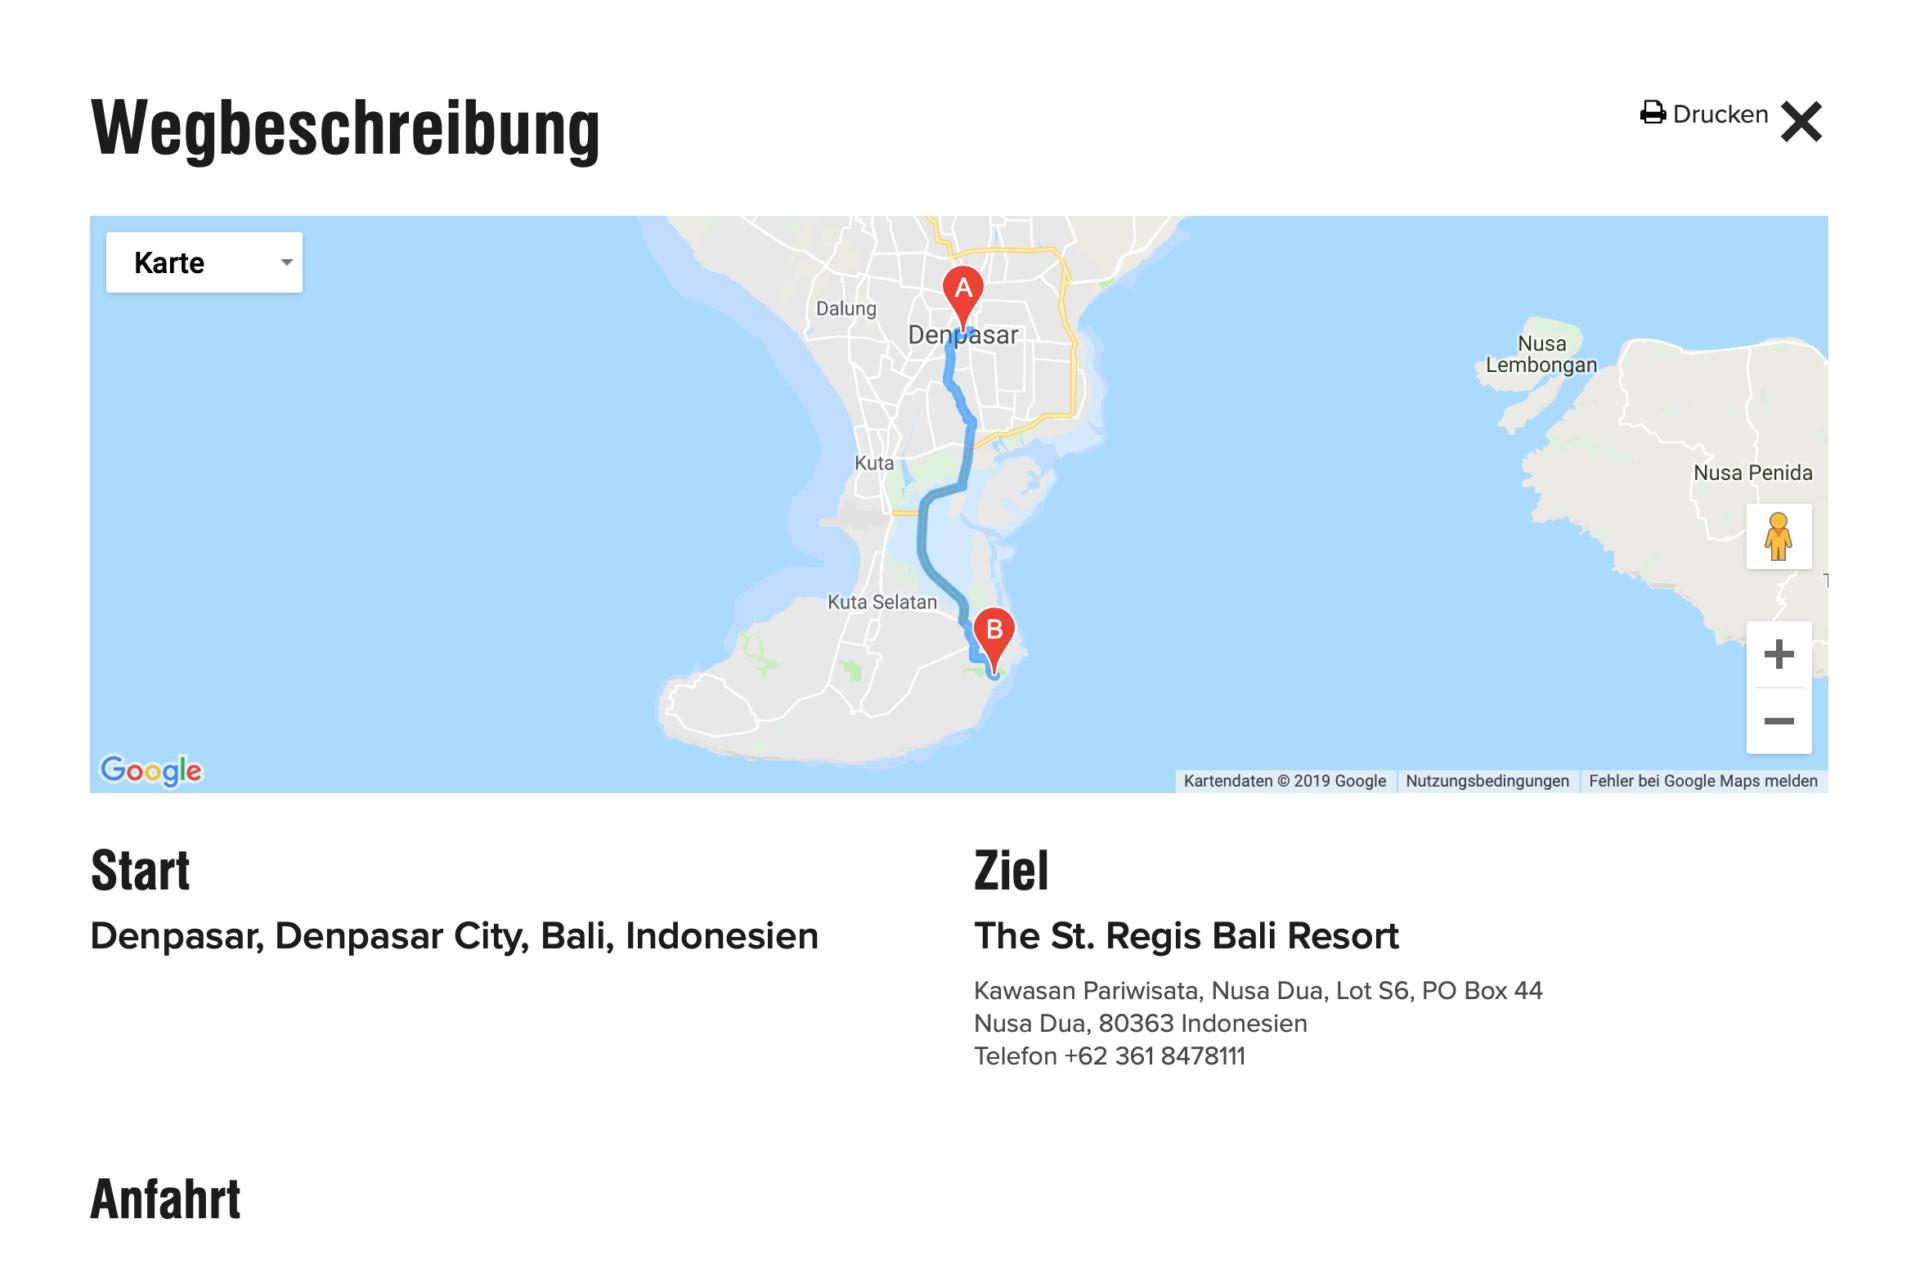 Wegbeschreibung St. Regis Bali Resort